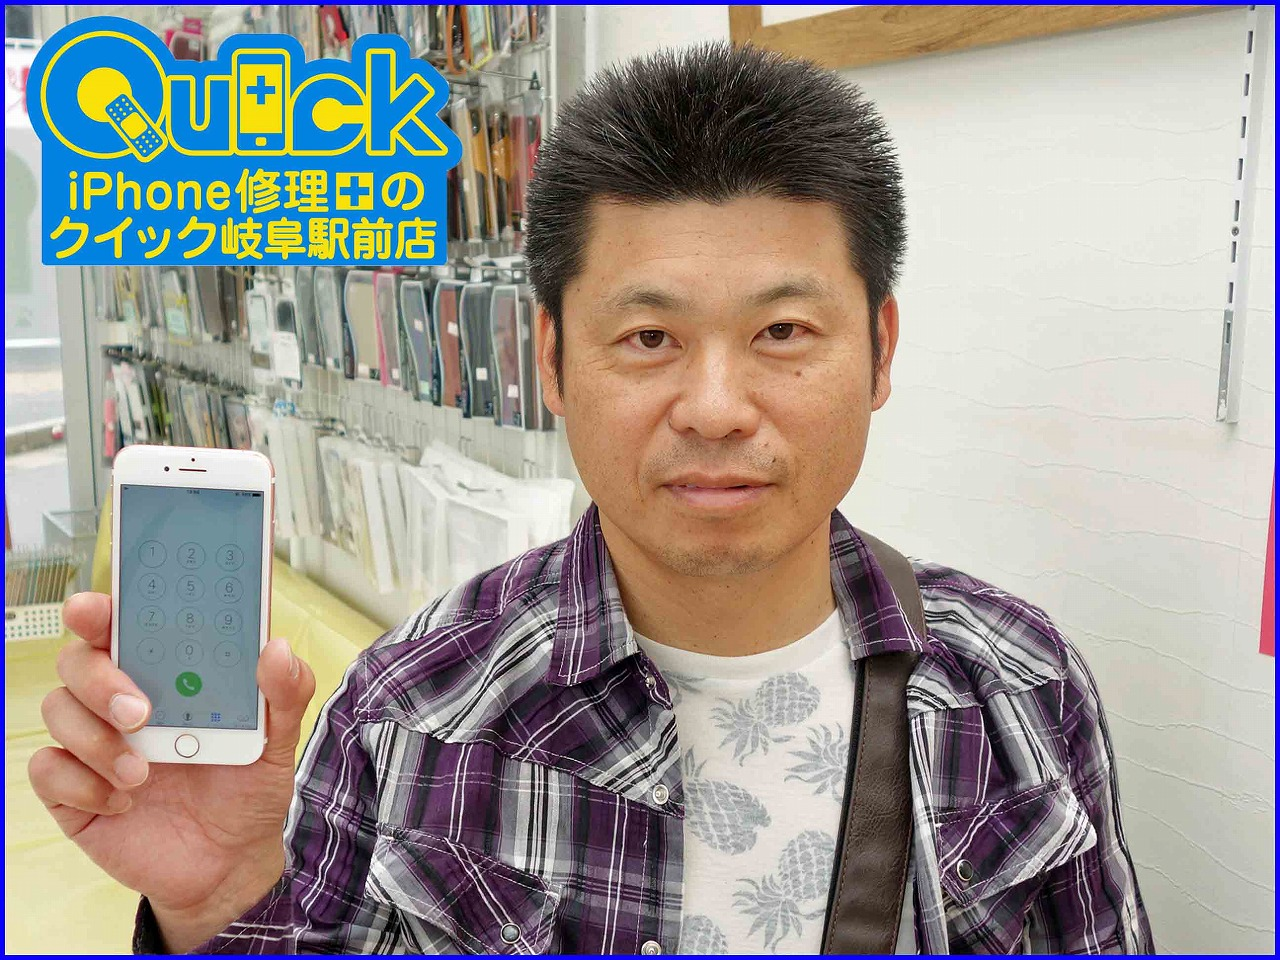 ☆iPhone7のガラス割れ交換修理に安川郡よりご来店!アイフォン修理のクイック岐阜